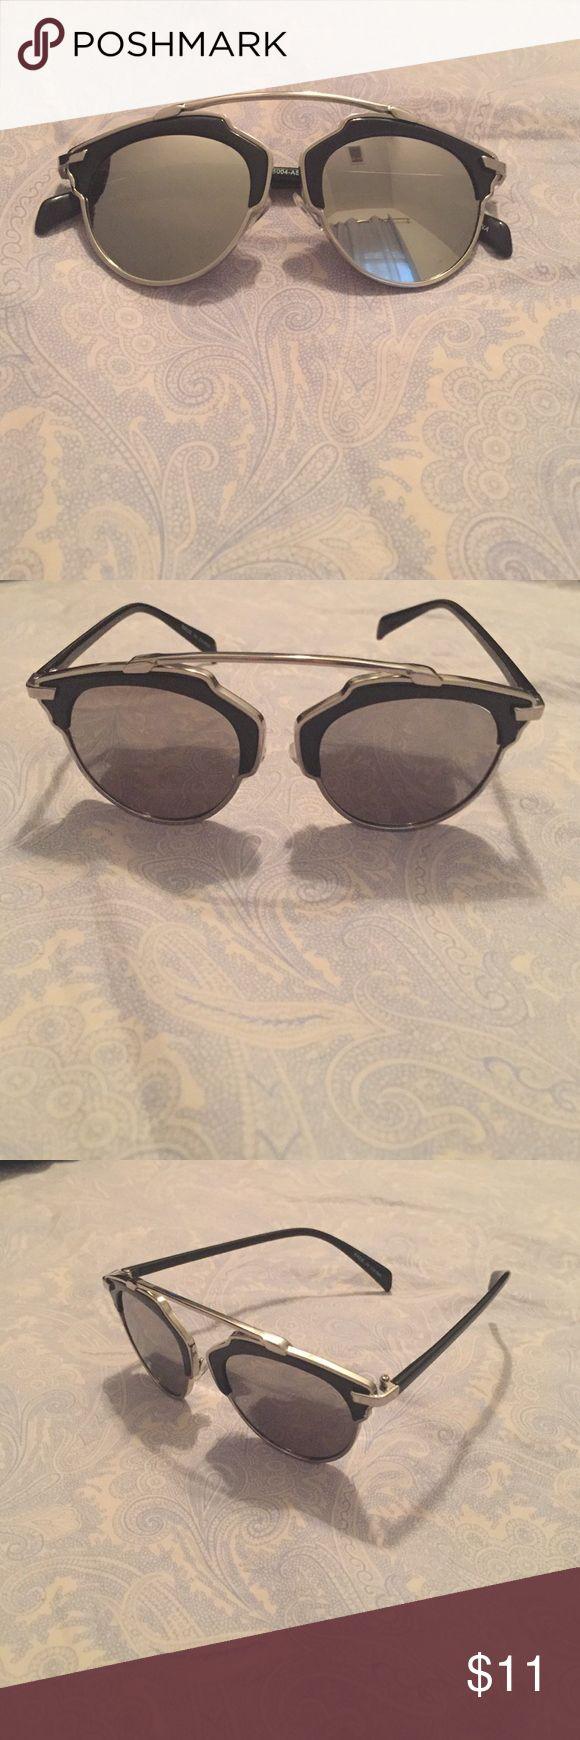 Selling this Women's Mirrored Sunglasses on Poshmark! My username is: bbergunk. #shopmycloset #poshmark #fashion #shopping #style #forsale #Accessories